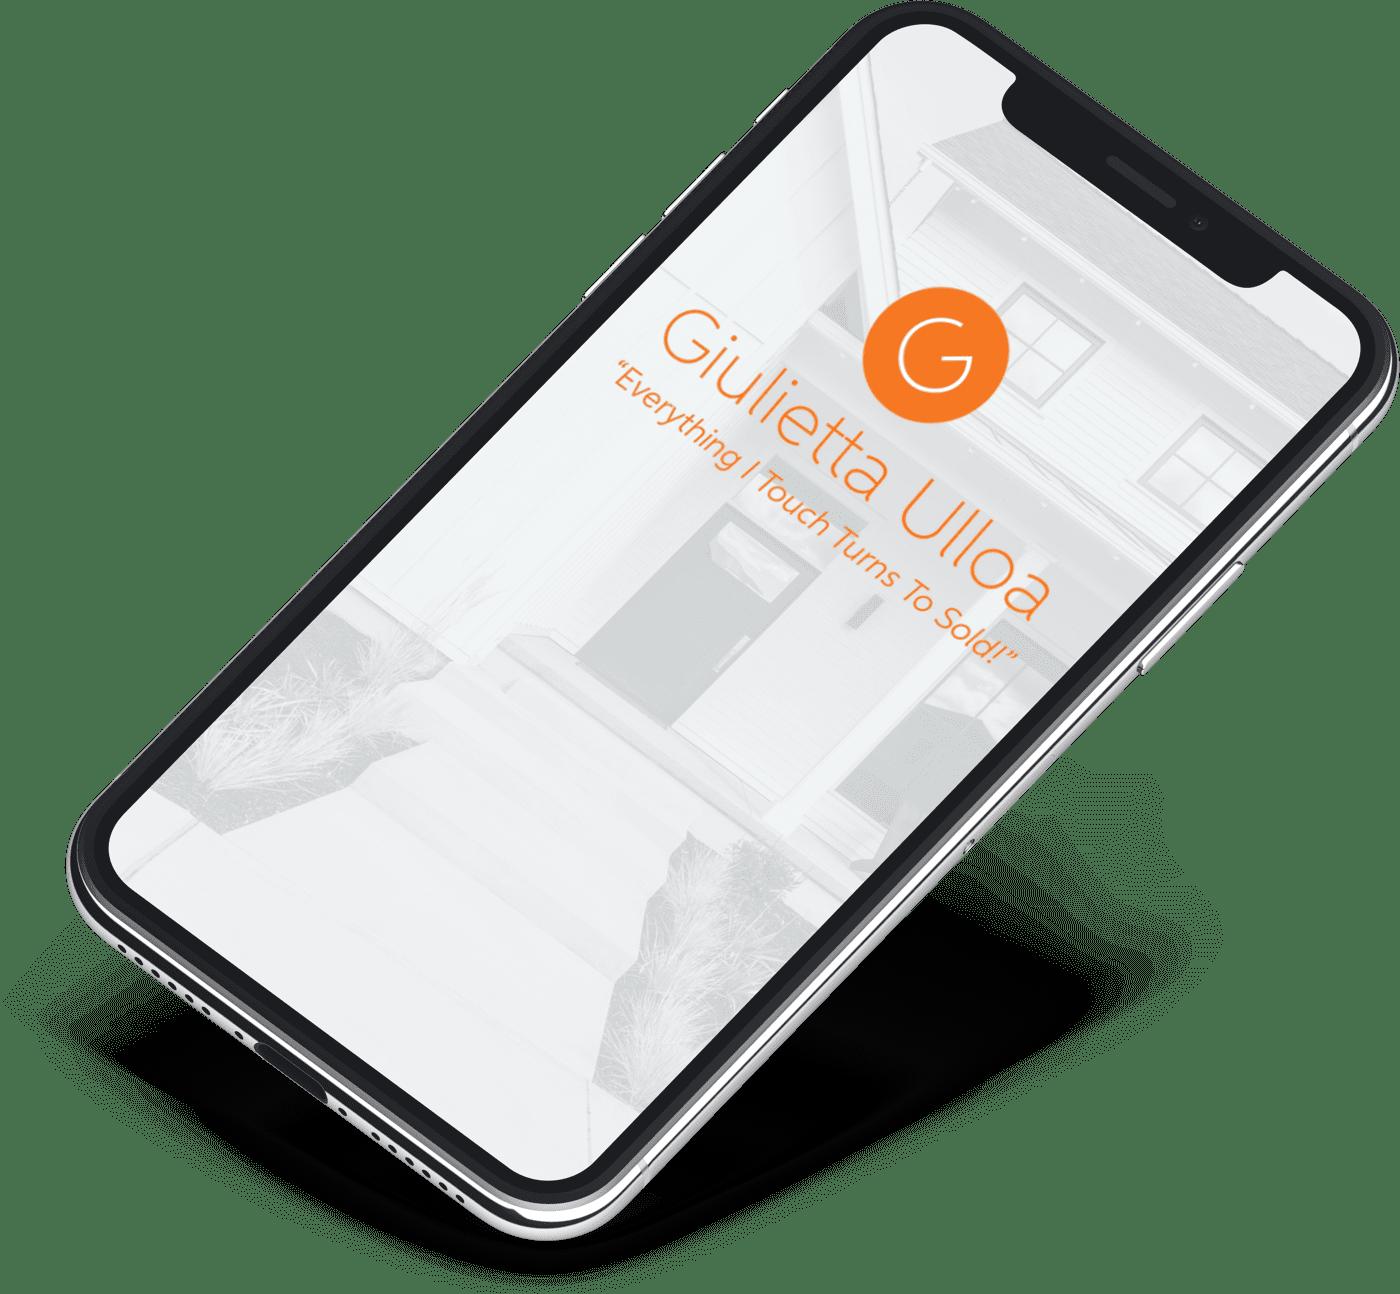 Giulietta Ulloa Key Biscayne Realtor App